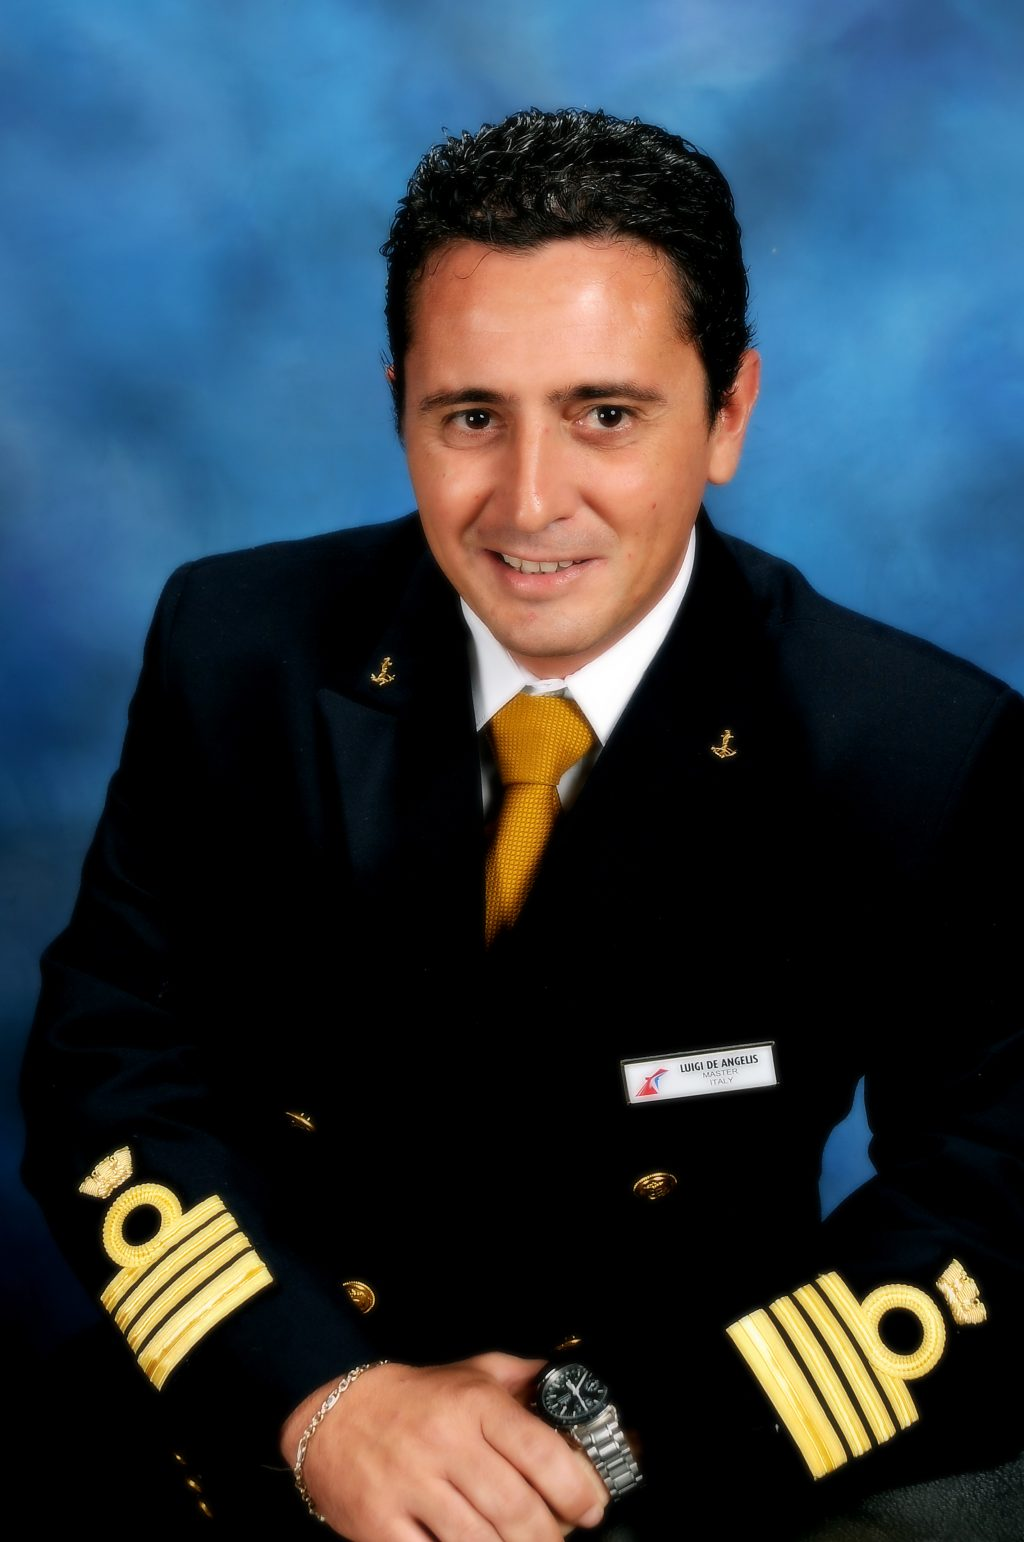 Carnival Horizon officers Captain Luigi De Angelis